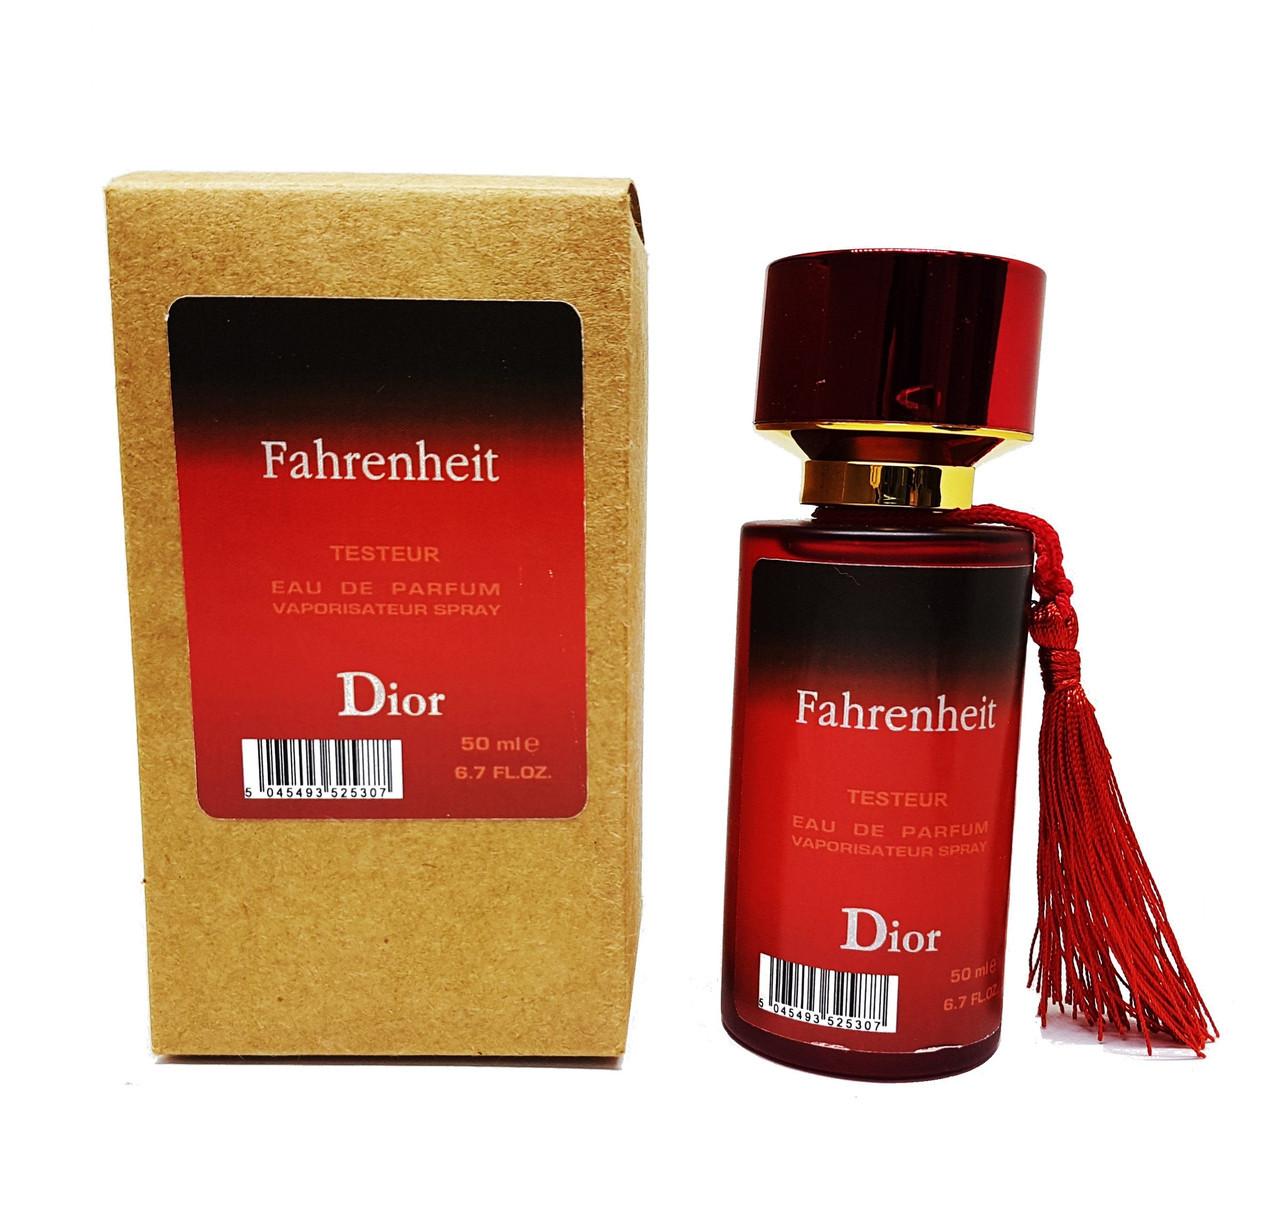 Christian Dior Fahreinheit - Testeur 50ml